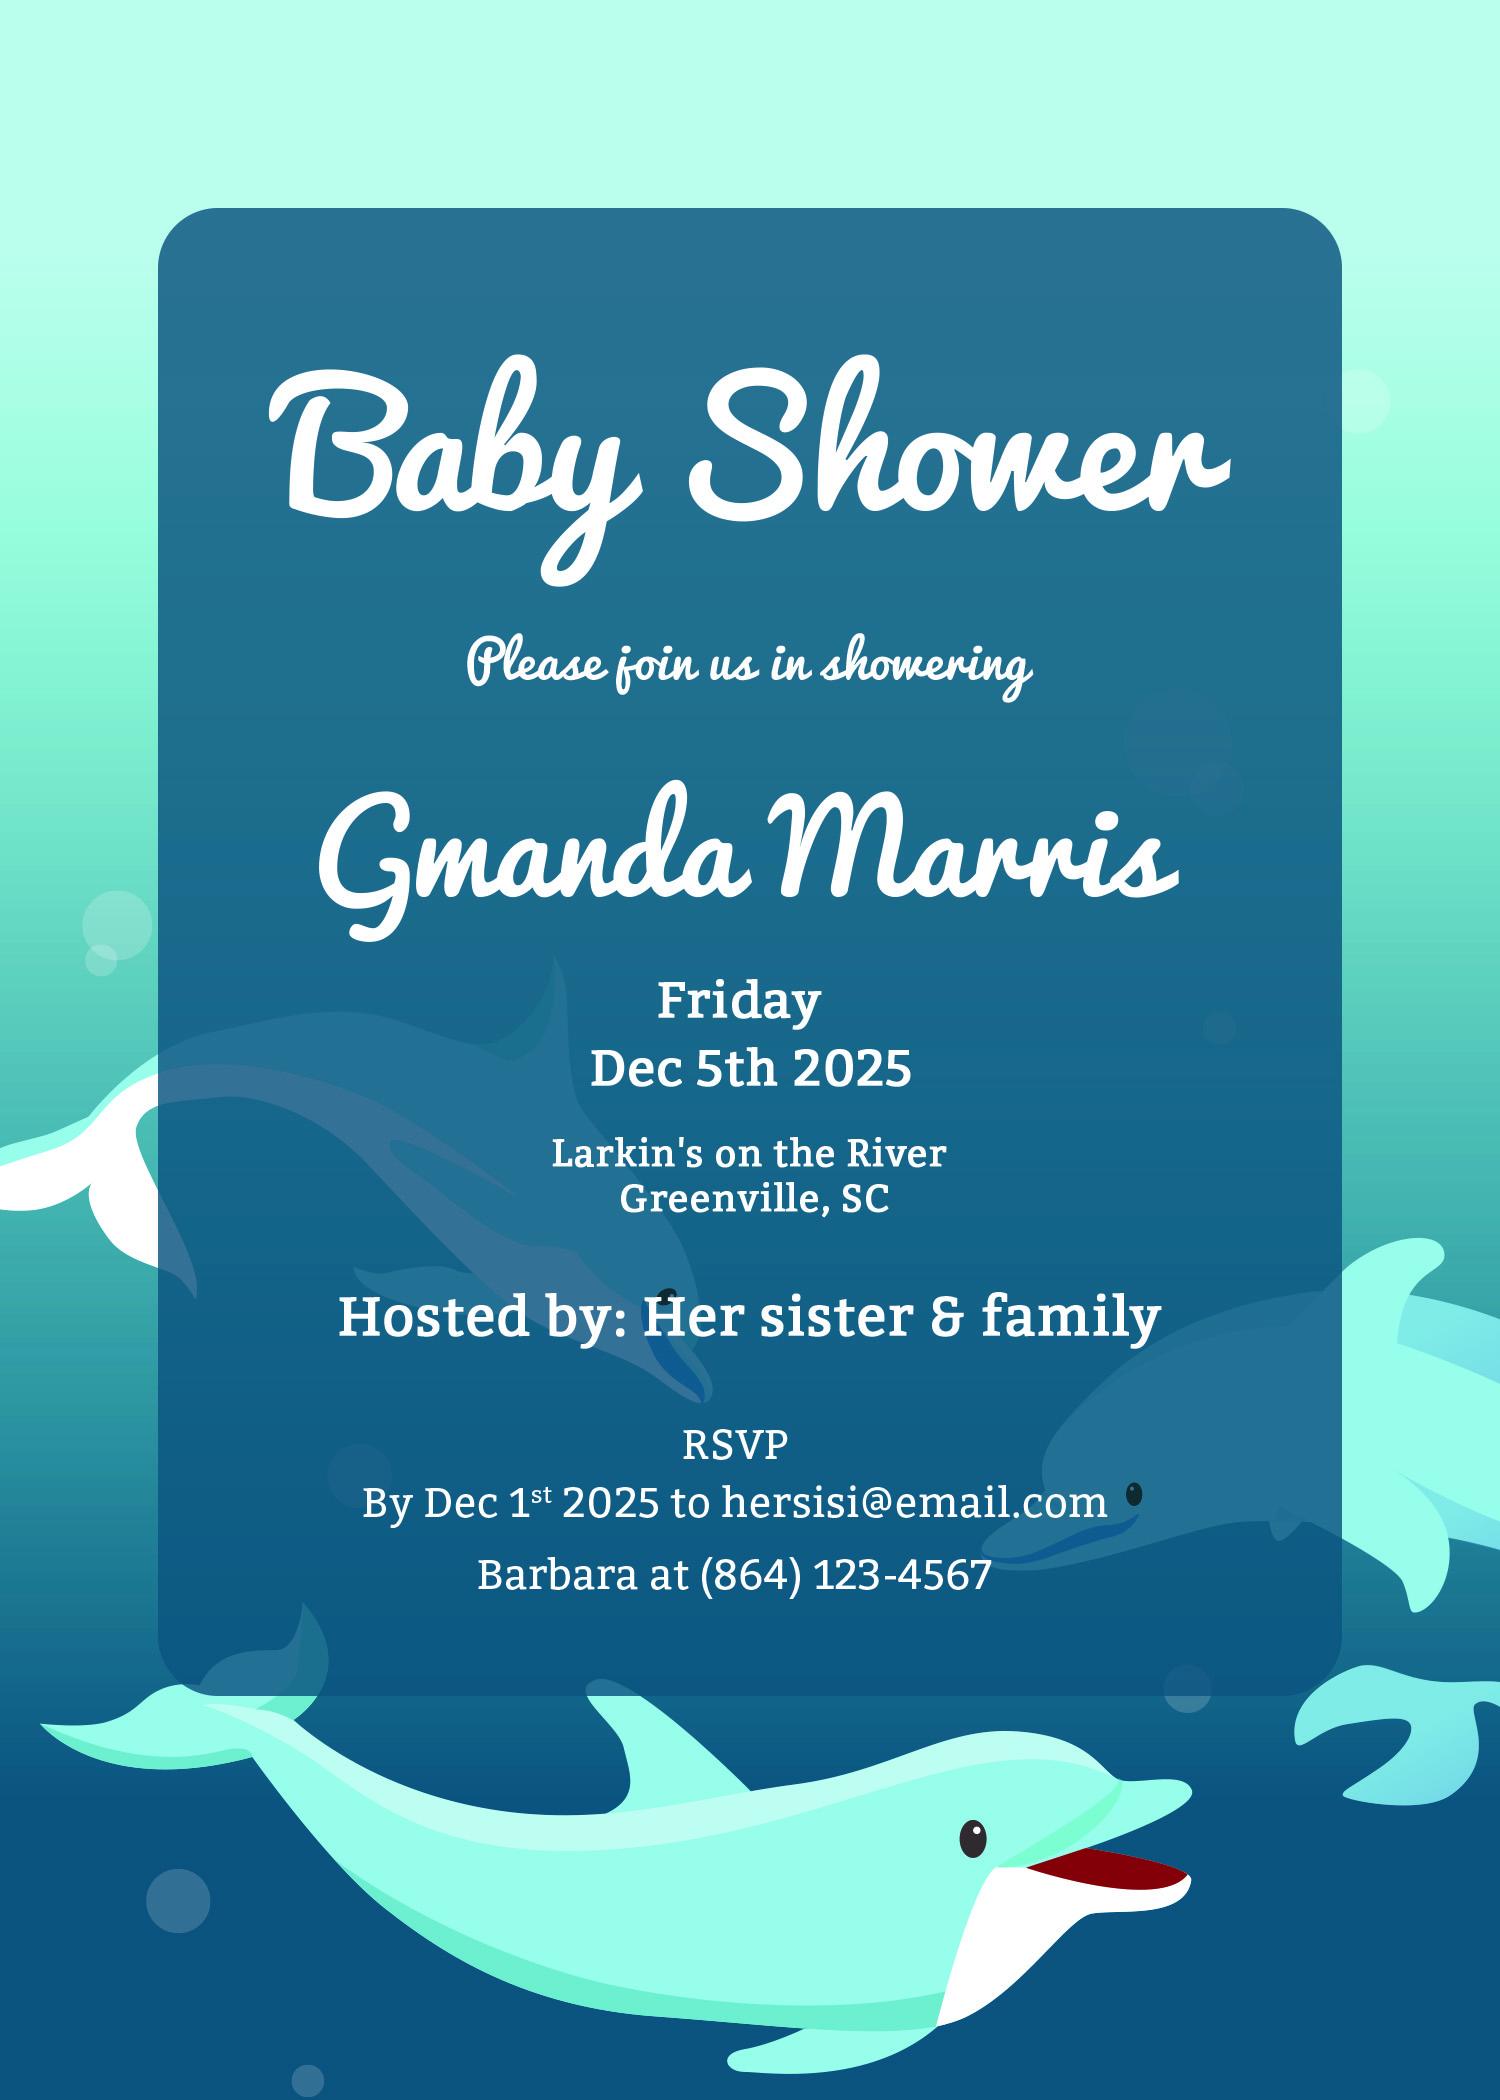 Onesie Baby Shower Invitation Template from www.geckoandfly.com